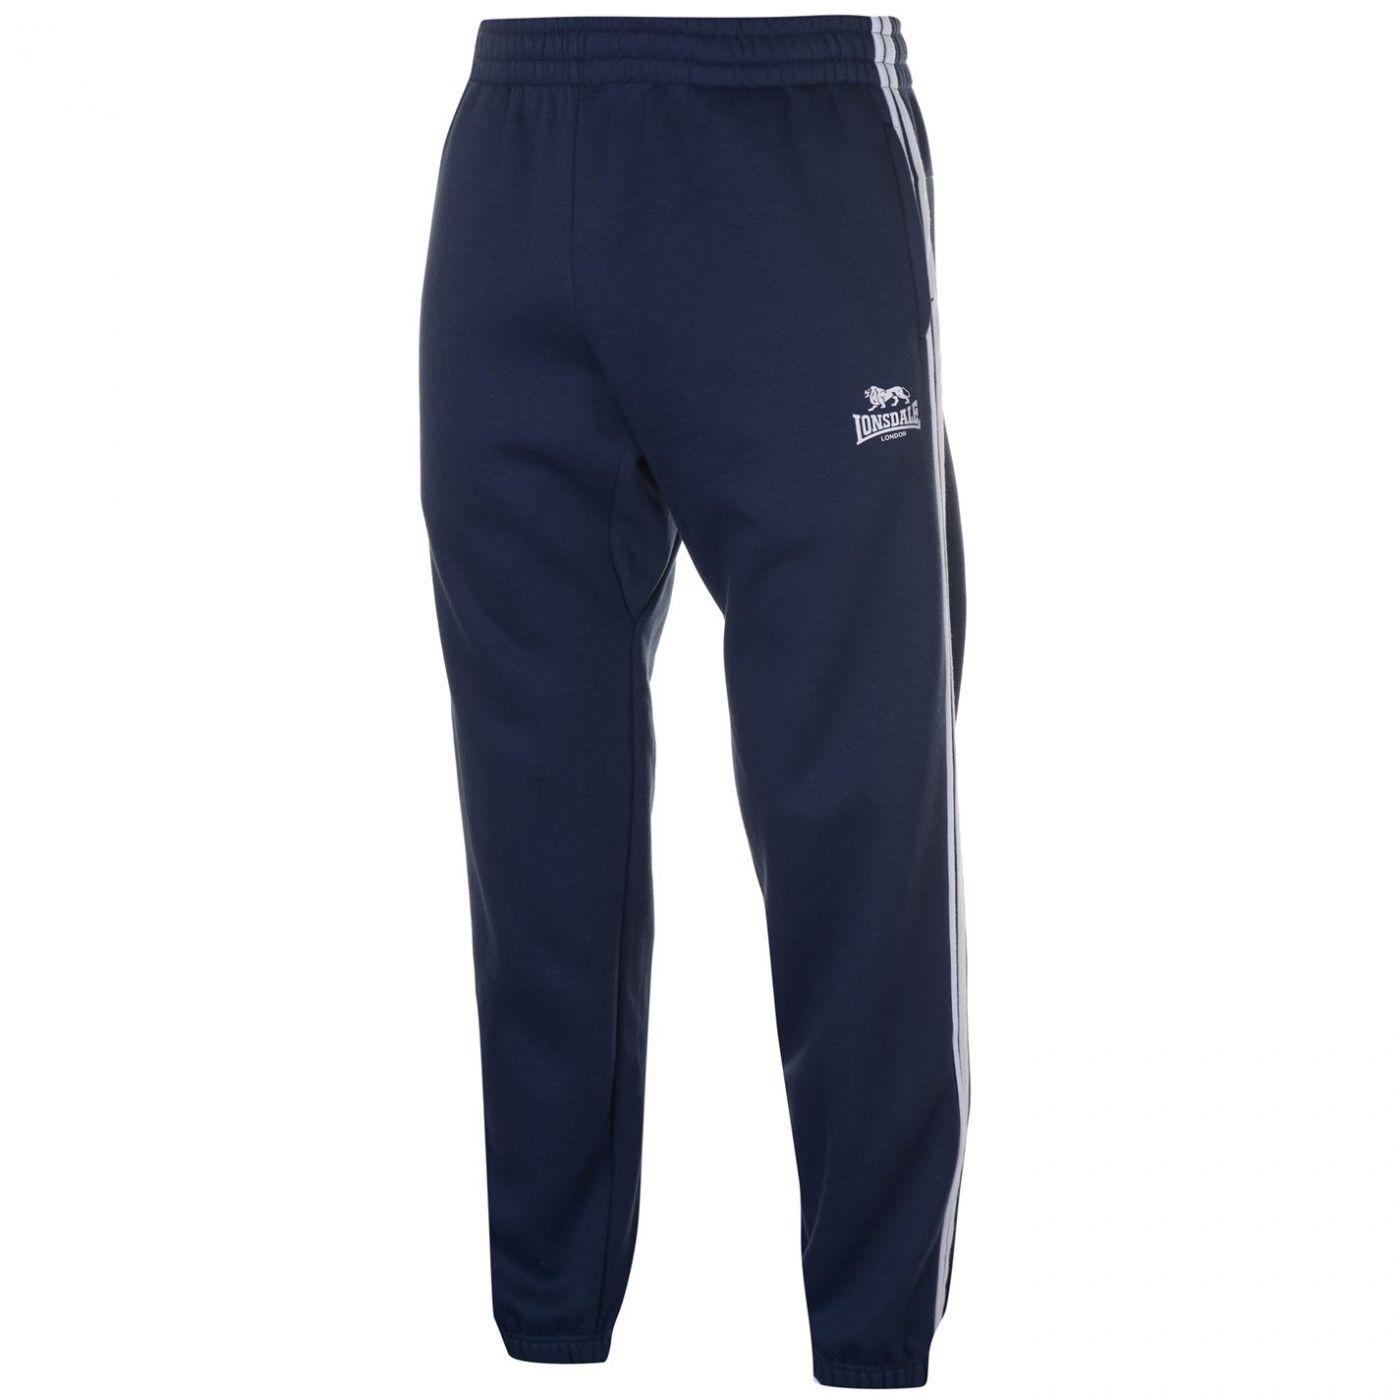 Lonsdale 2 Stripe Jogging Pants Mens